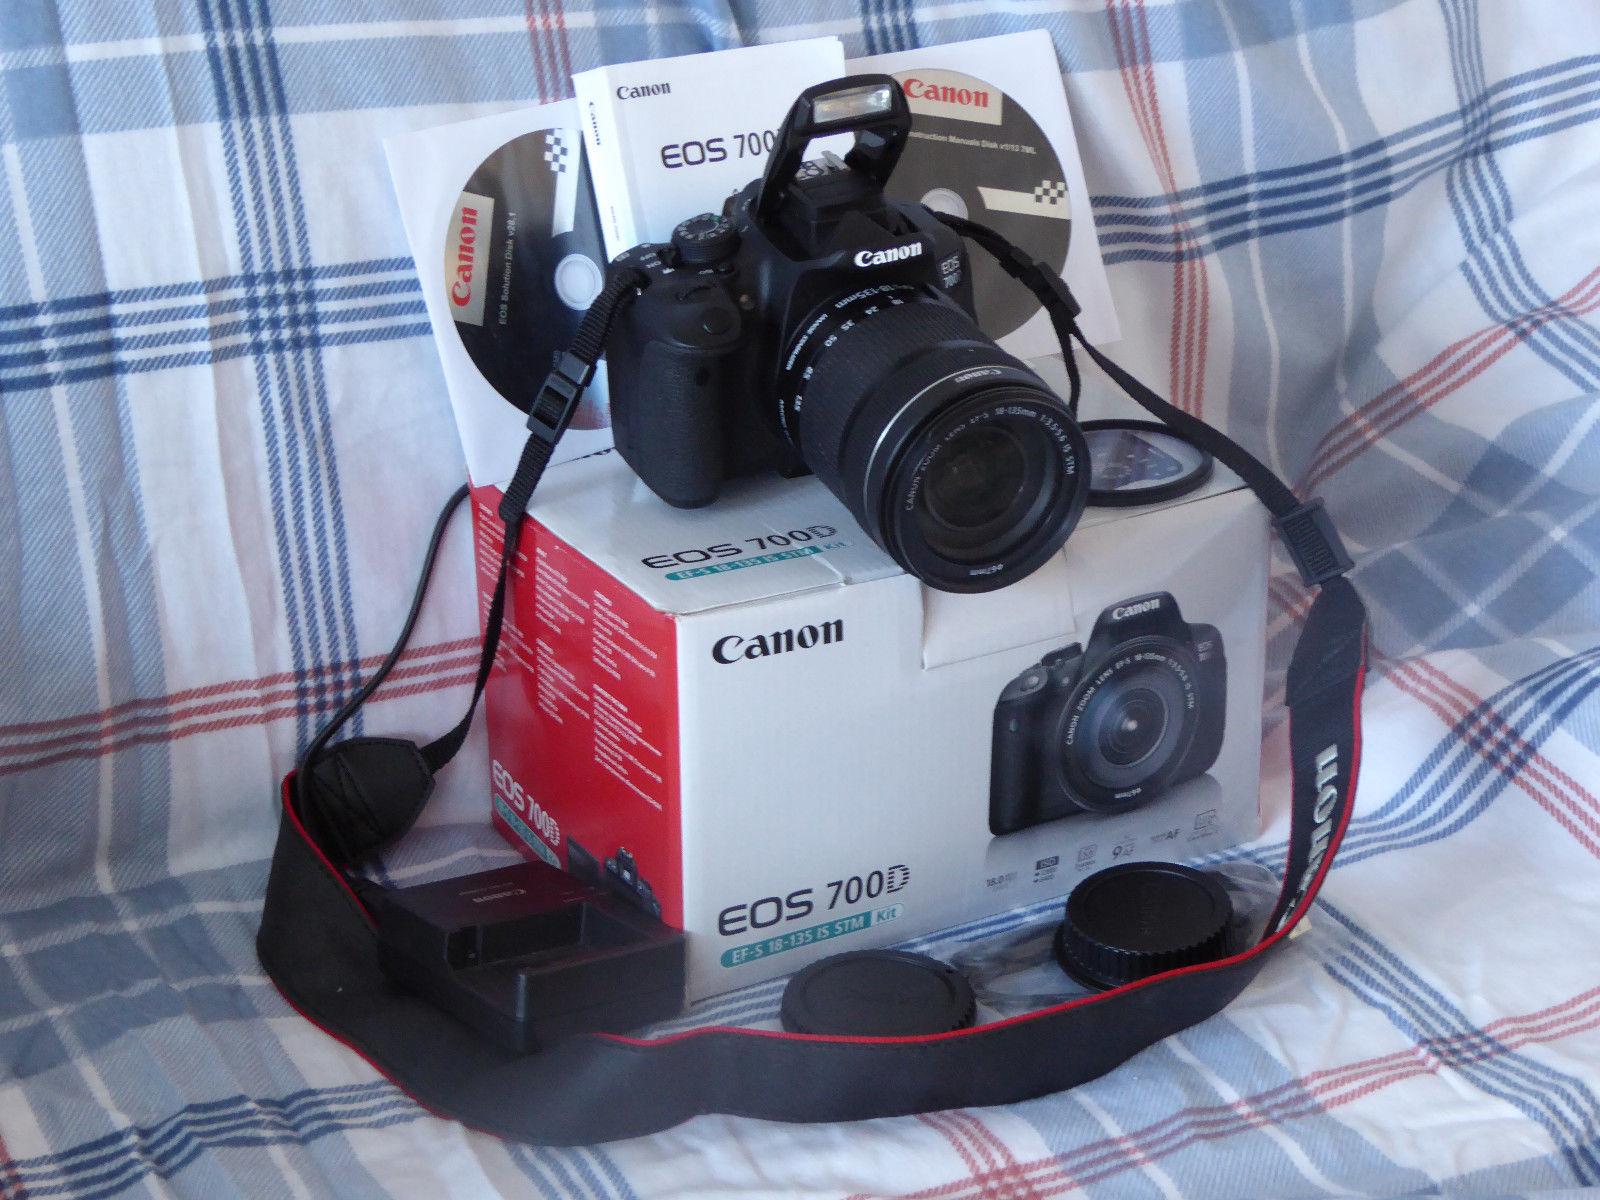 Canon EOS 700D 18.0MP (Kit mit 18-135 mm Canon IS STM Objektiv)